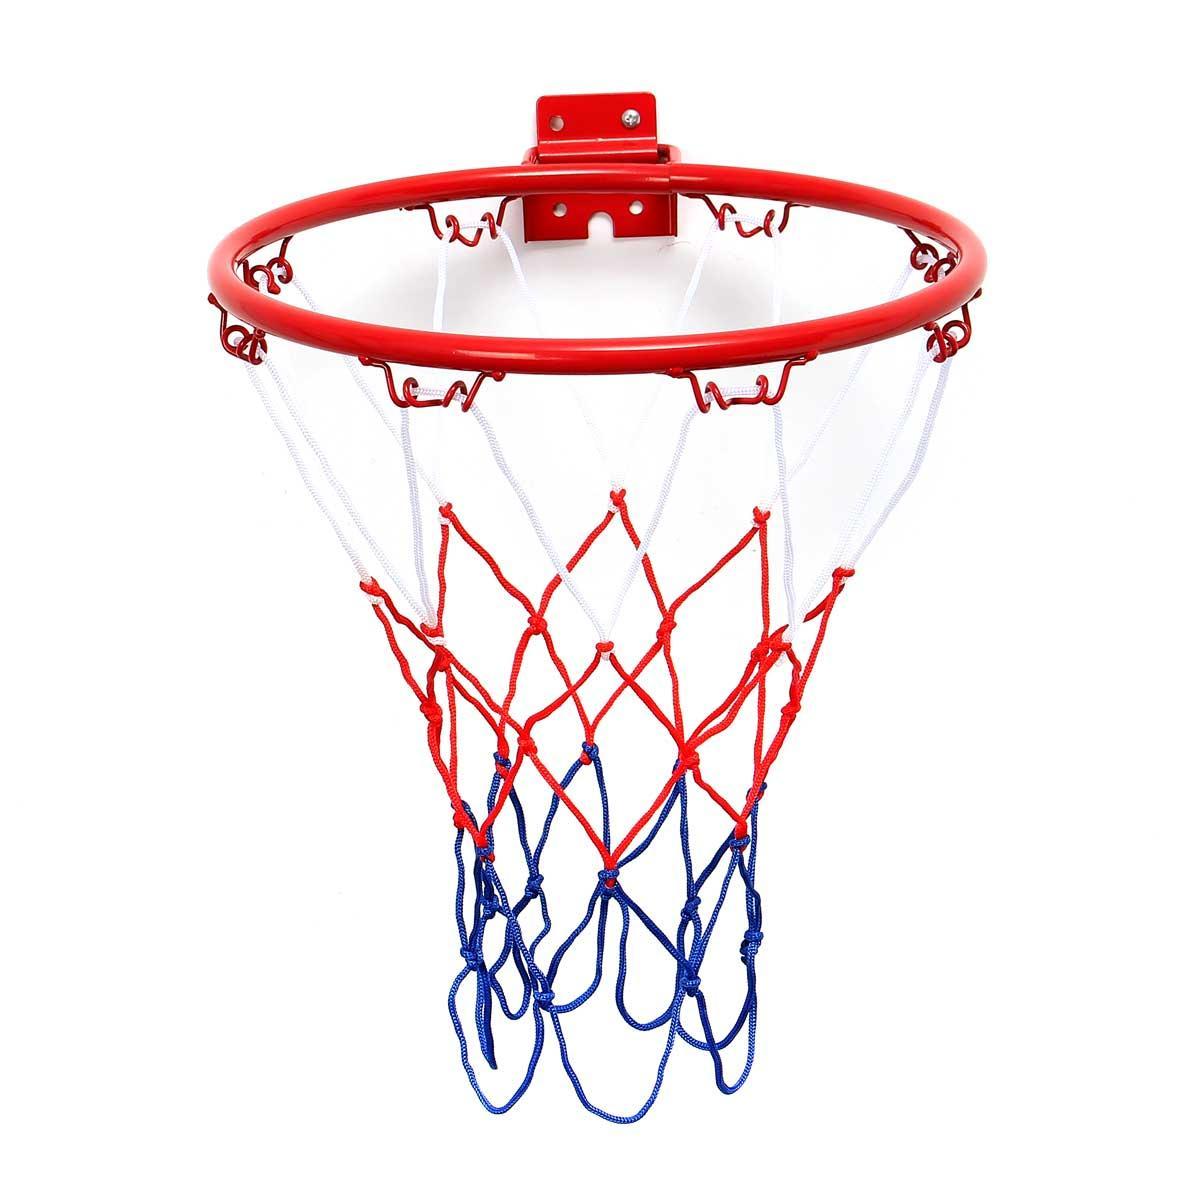 1200x1200 32cm45cm Wall Mounted Hanging Basketball Goal Hoop Rim Net Metal